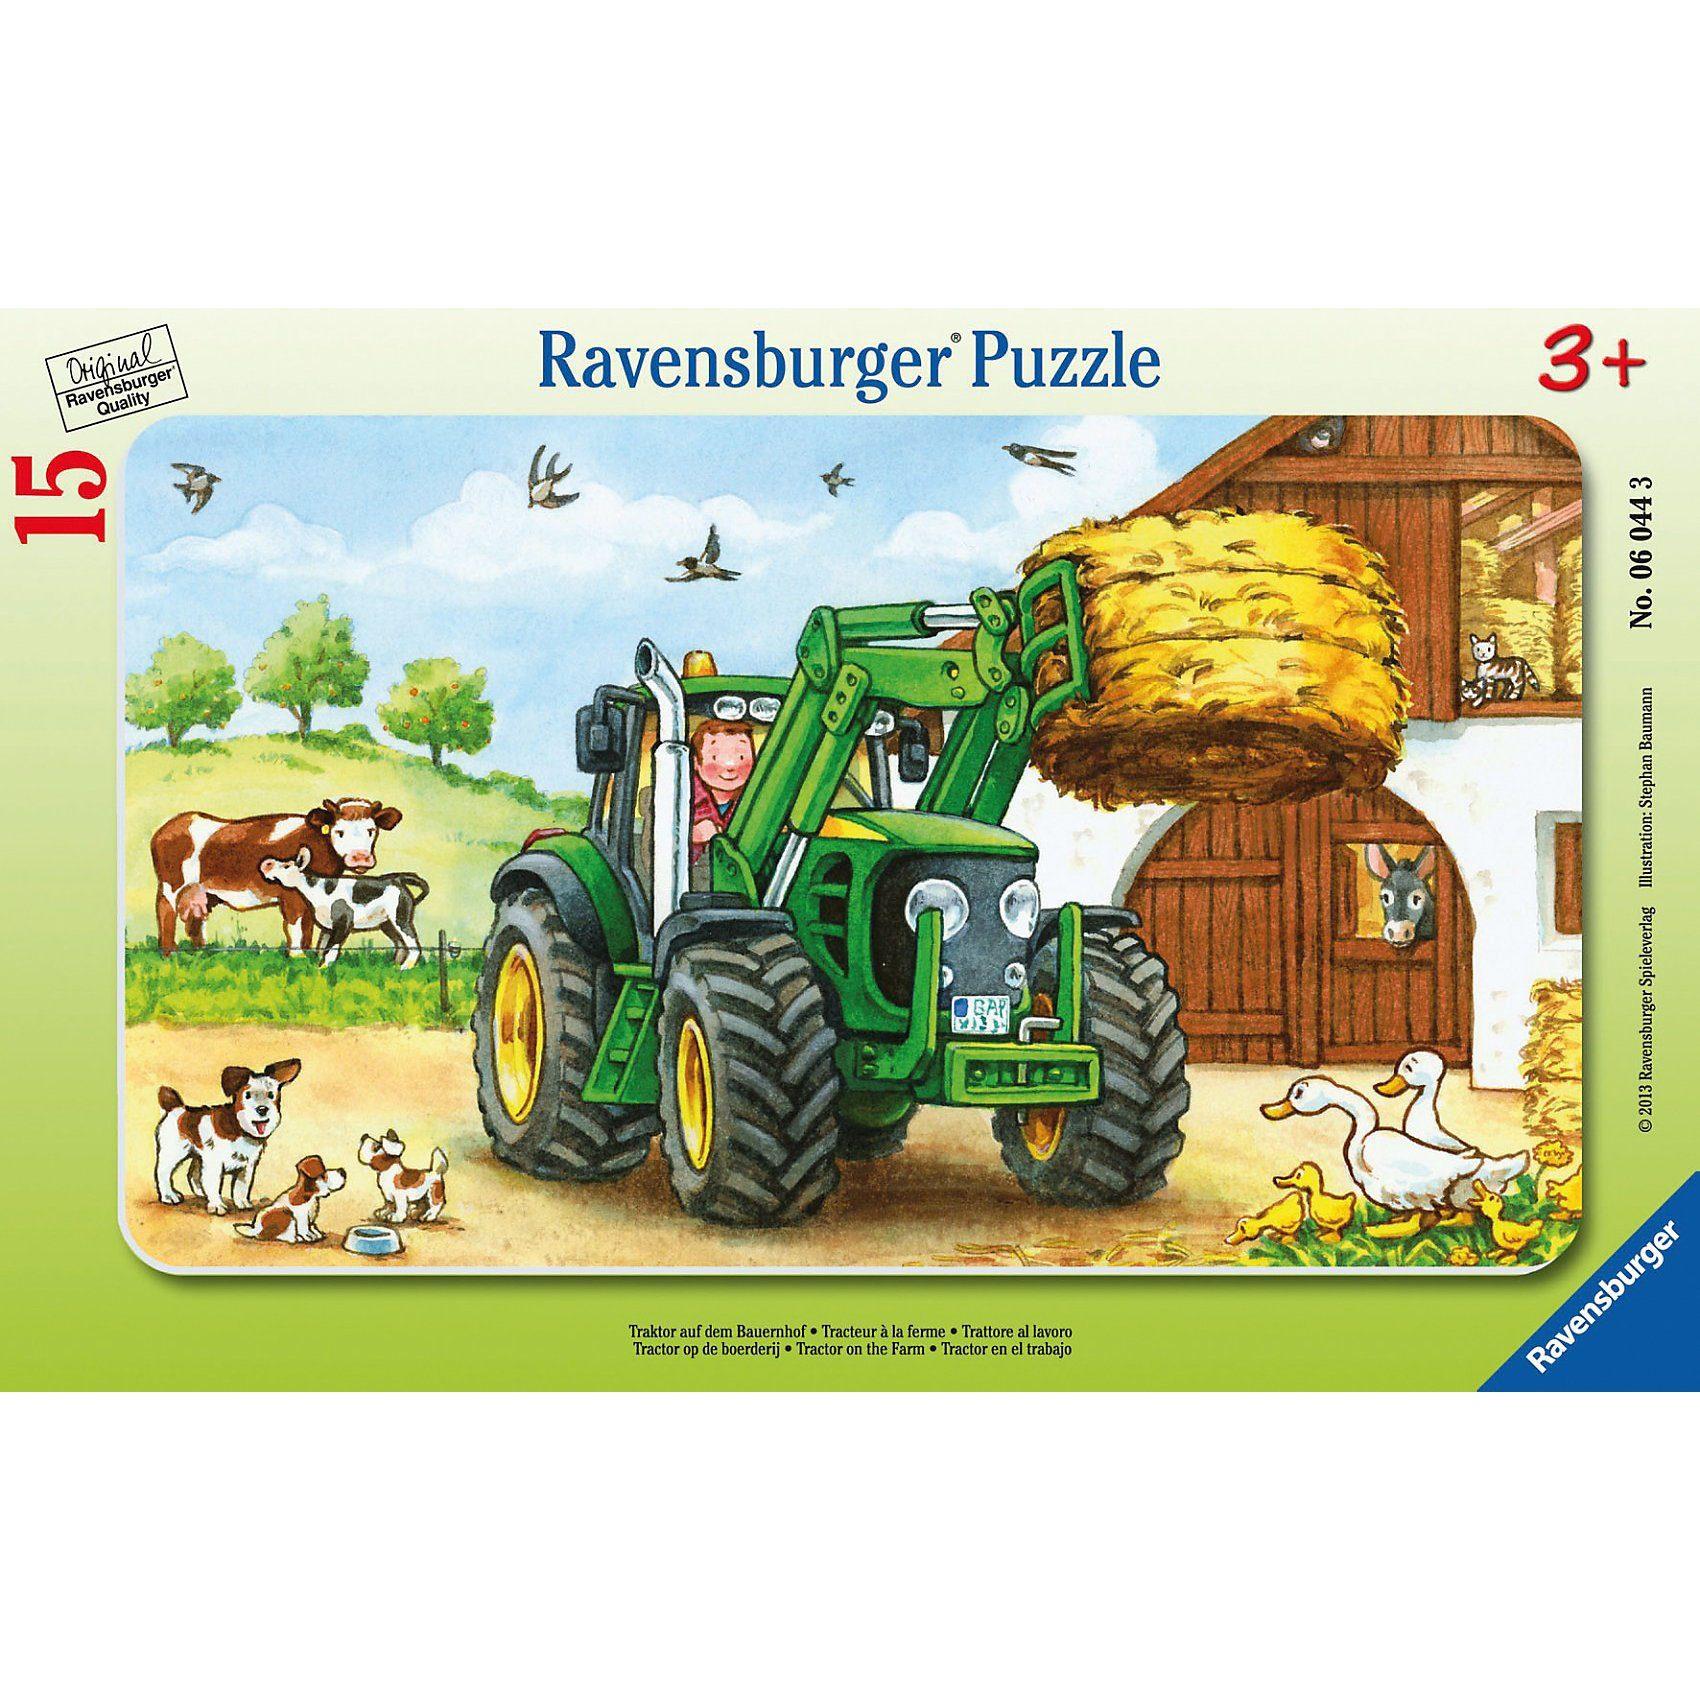 Ravensburger Puzzle Traktor auf dem Bauernhof 15 Teile